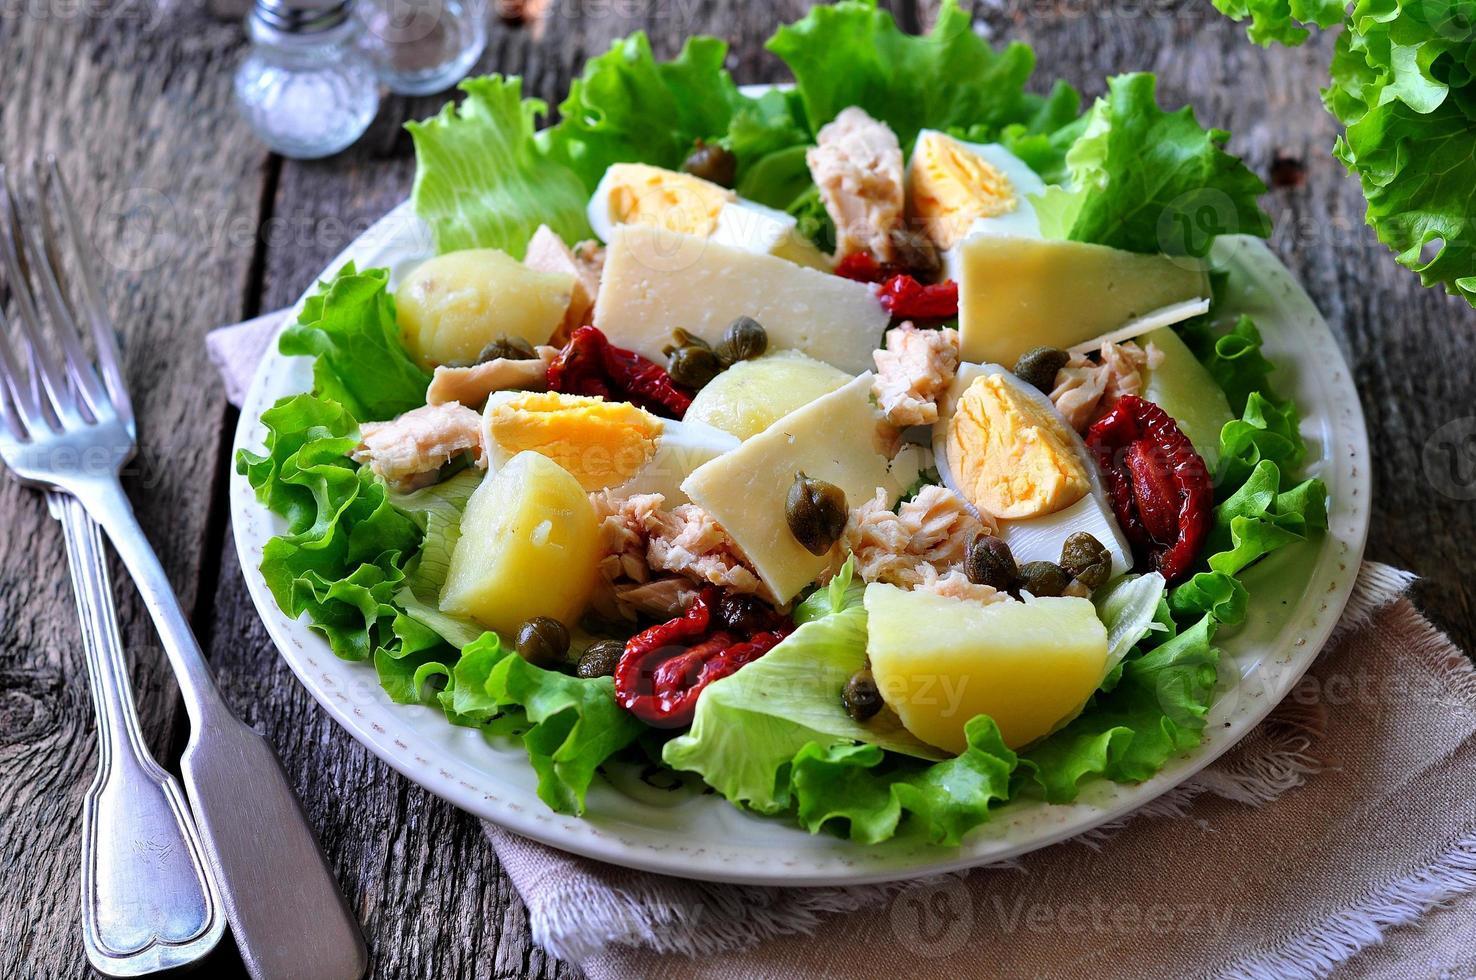 salada de alface, alface, com atum em conserva, tomate seco foto